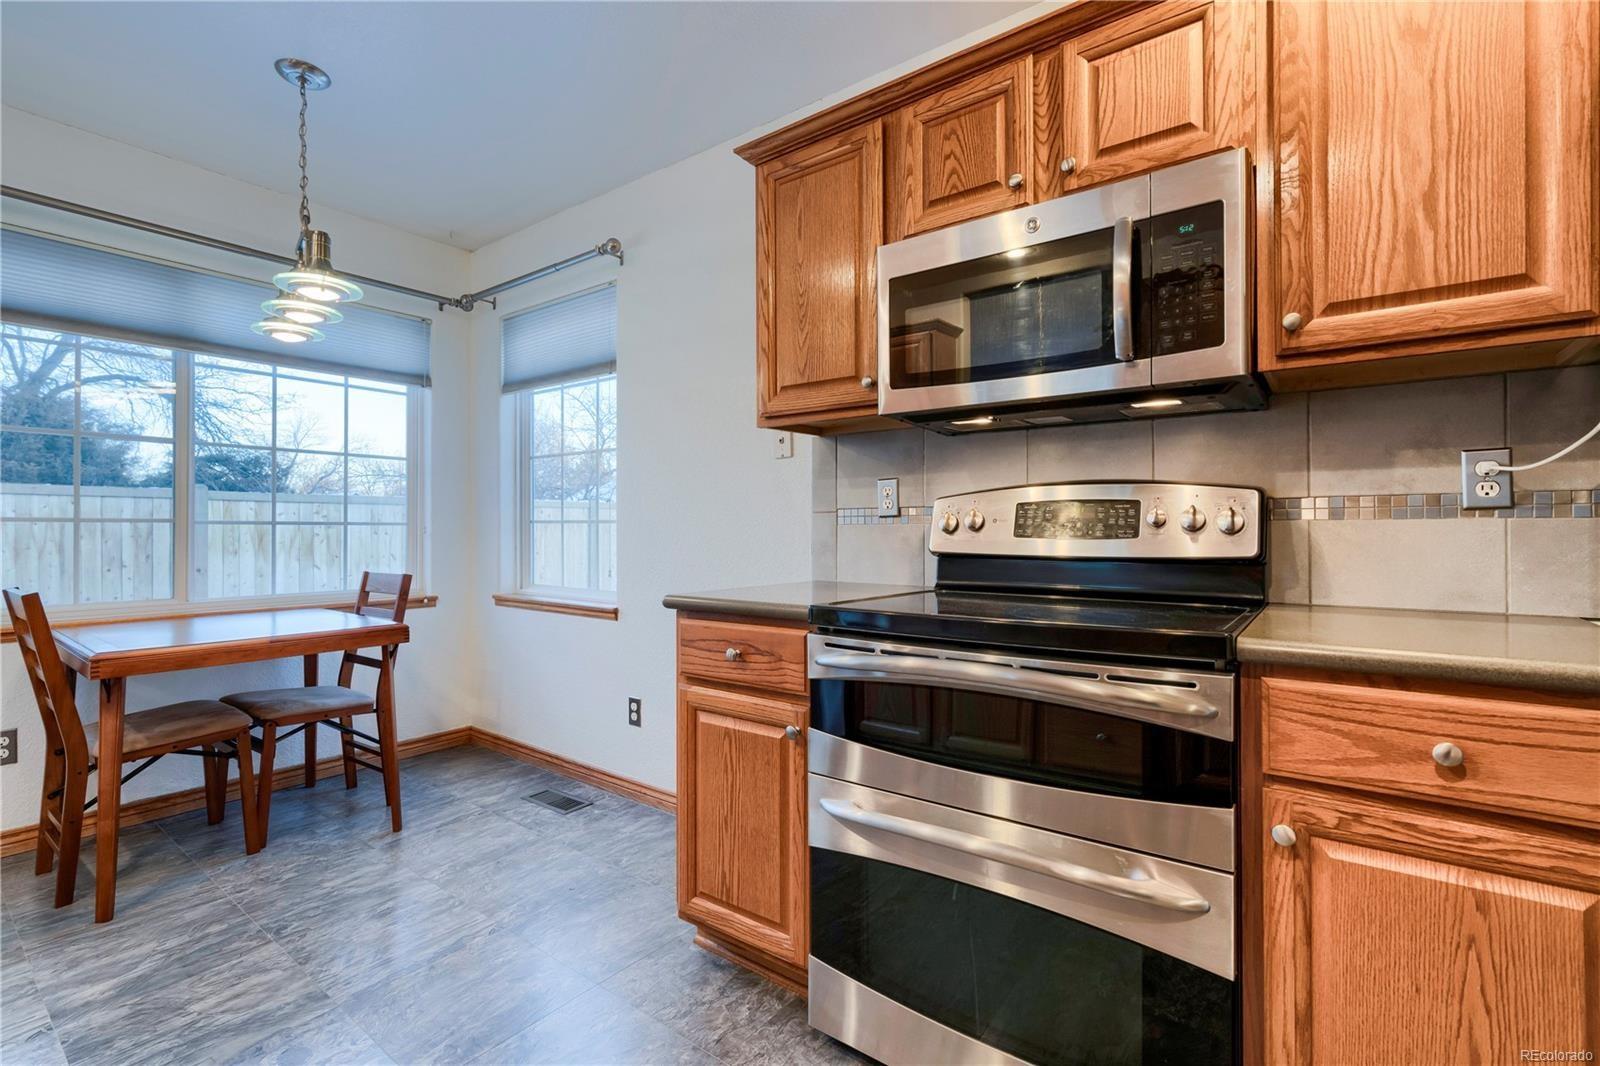 MLS# 7511958 - 8 - 900 Arbor Avenue #6, Fort Collins, CO 80526